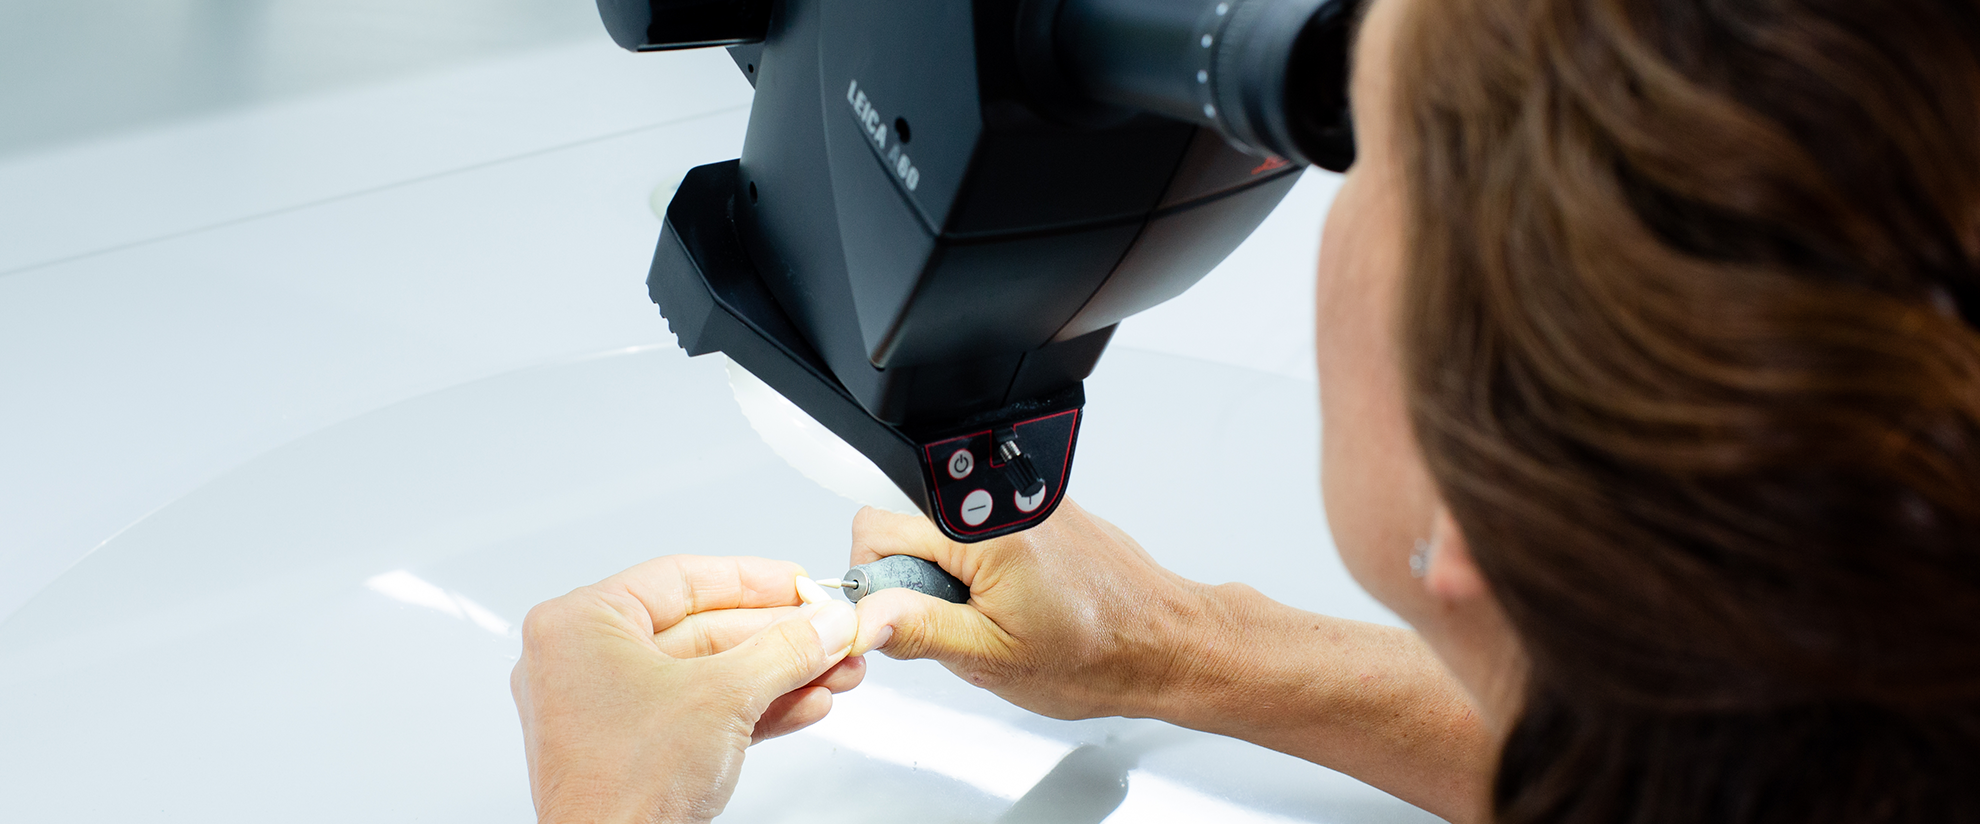 Mikroskop Dentallabor - LebenDich Dentalstudio GmbH